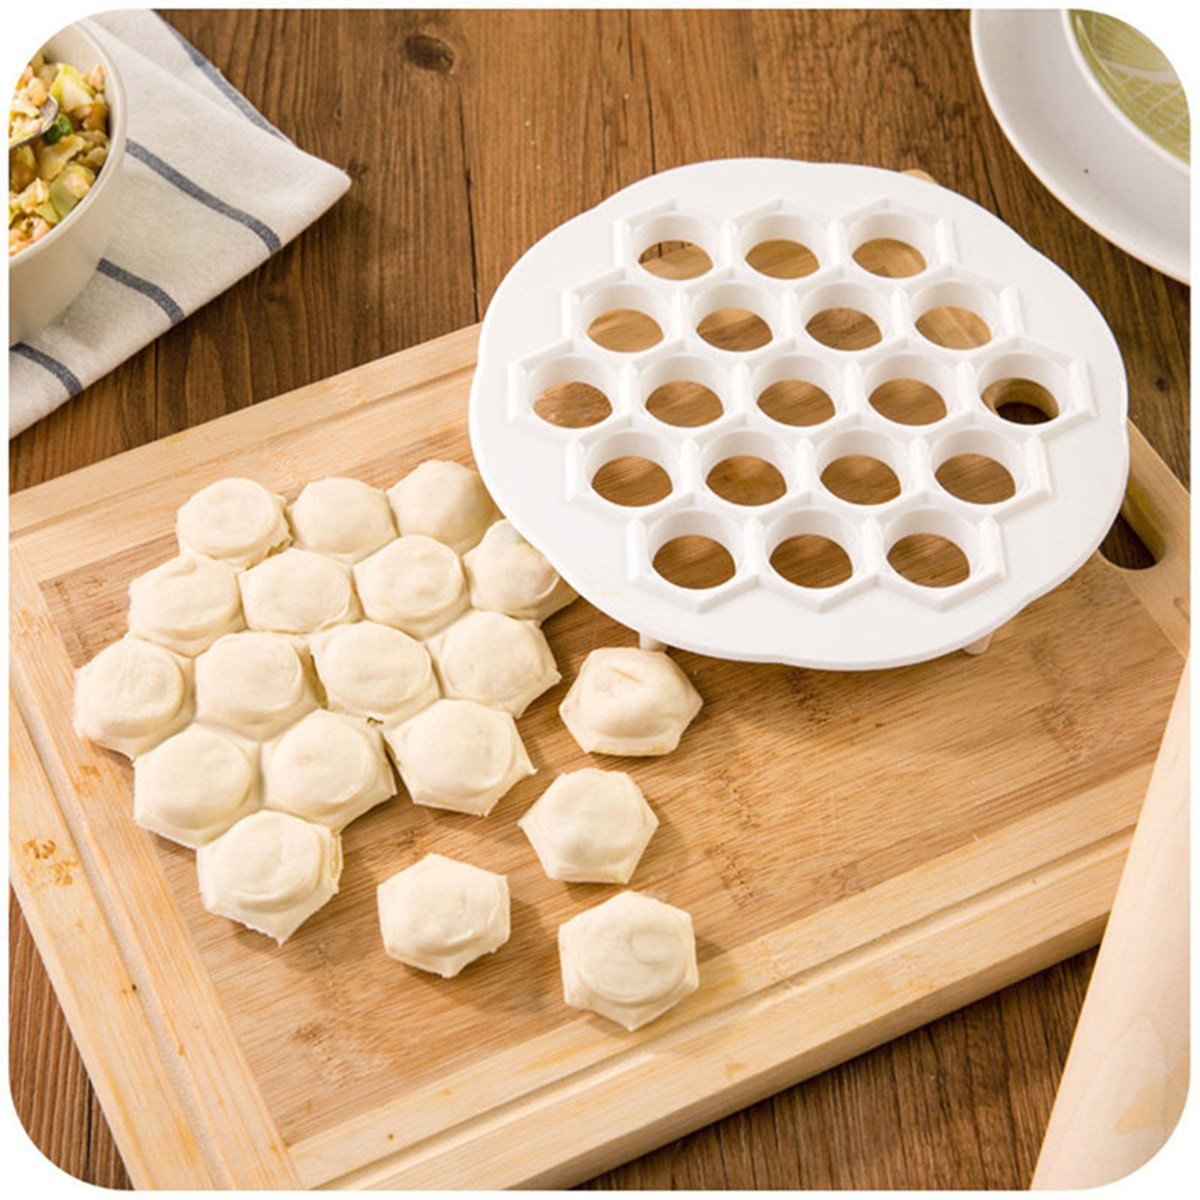 Affe 21x 2cm DIY Plastic Dumpling Mold Maker Dough Press Dumpling 19 Holes Dumplings Maker Mold ZGJ